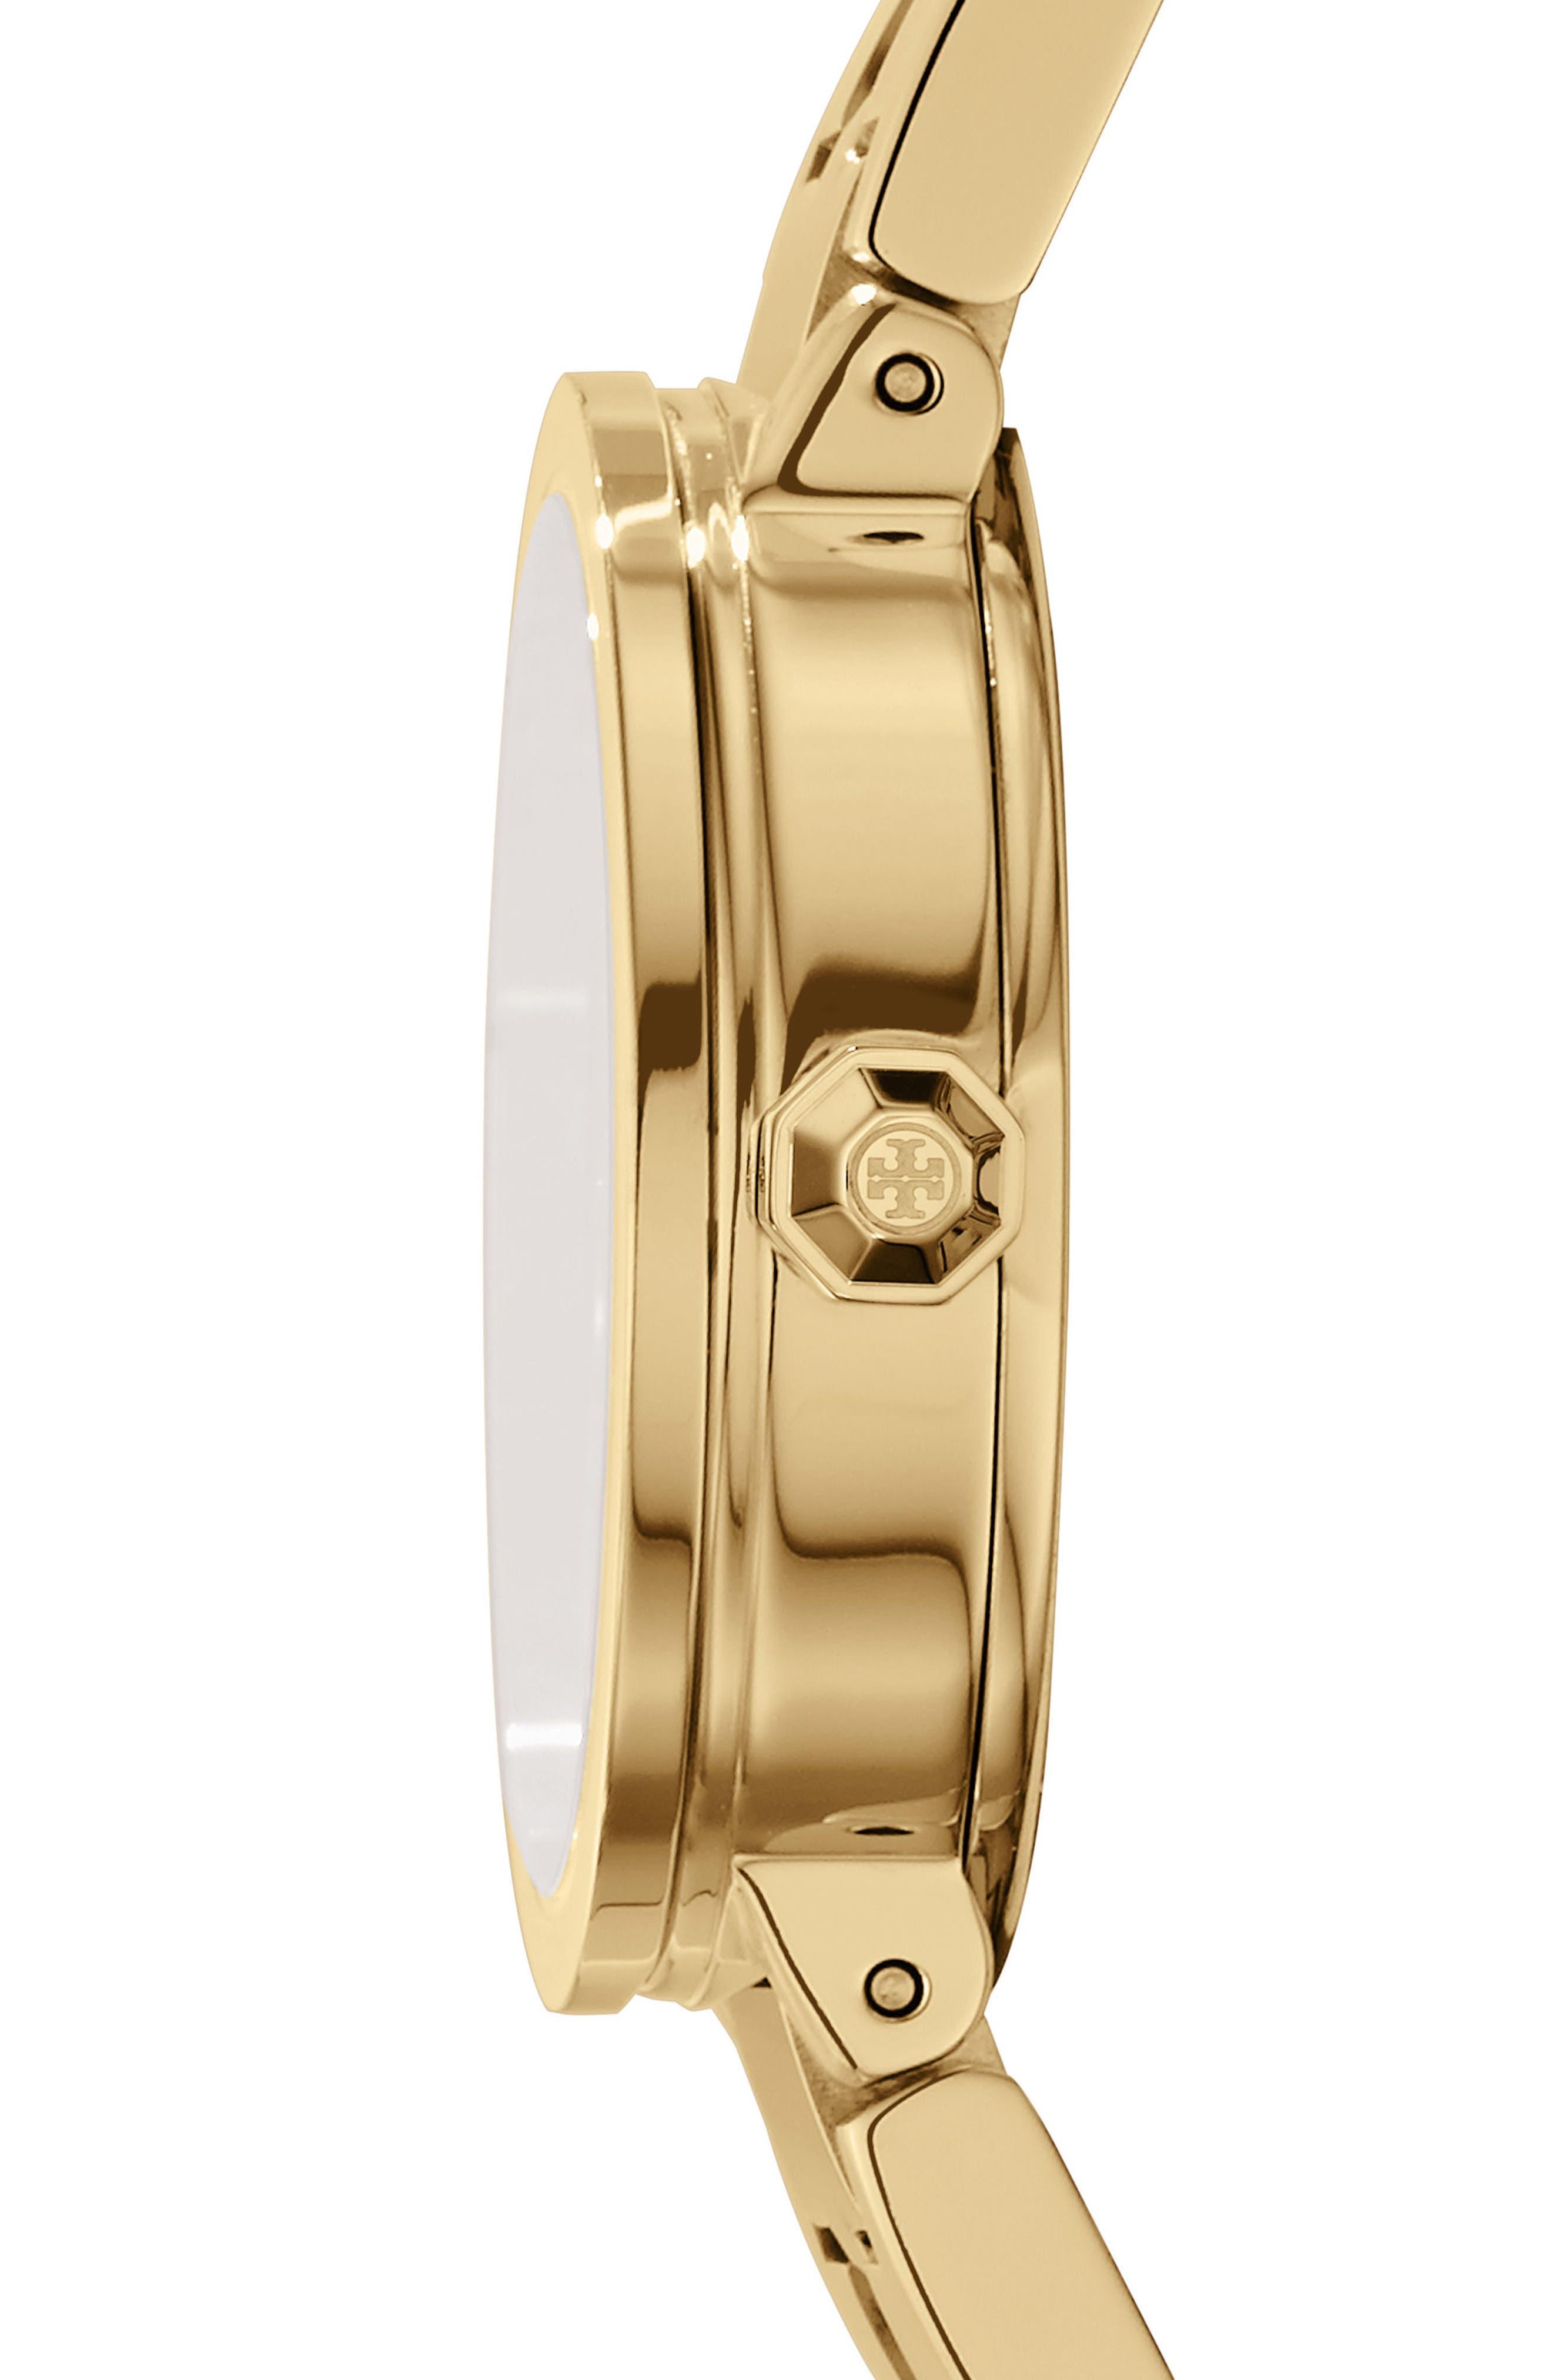 TORY BURCH, Reva Logo Dial Bracelet Watch, 28mm, Alternate thumbnail 2, color, GOLD/ IVORY/ GOLD